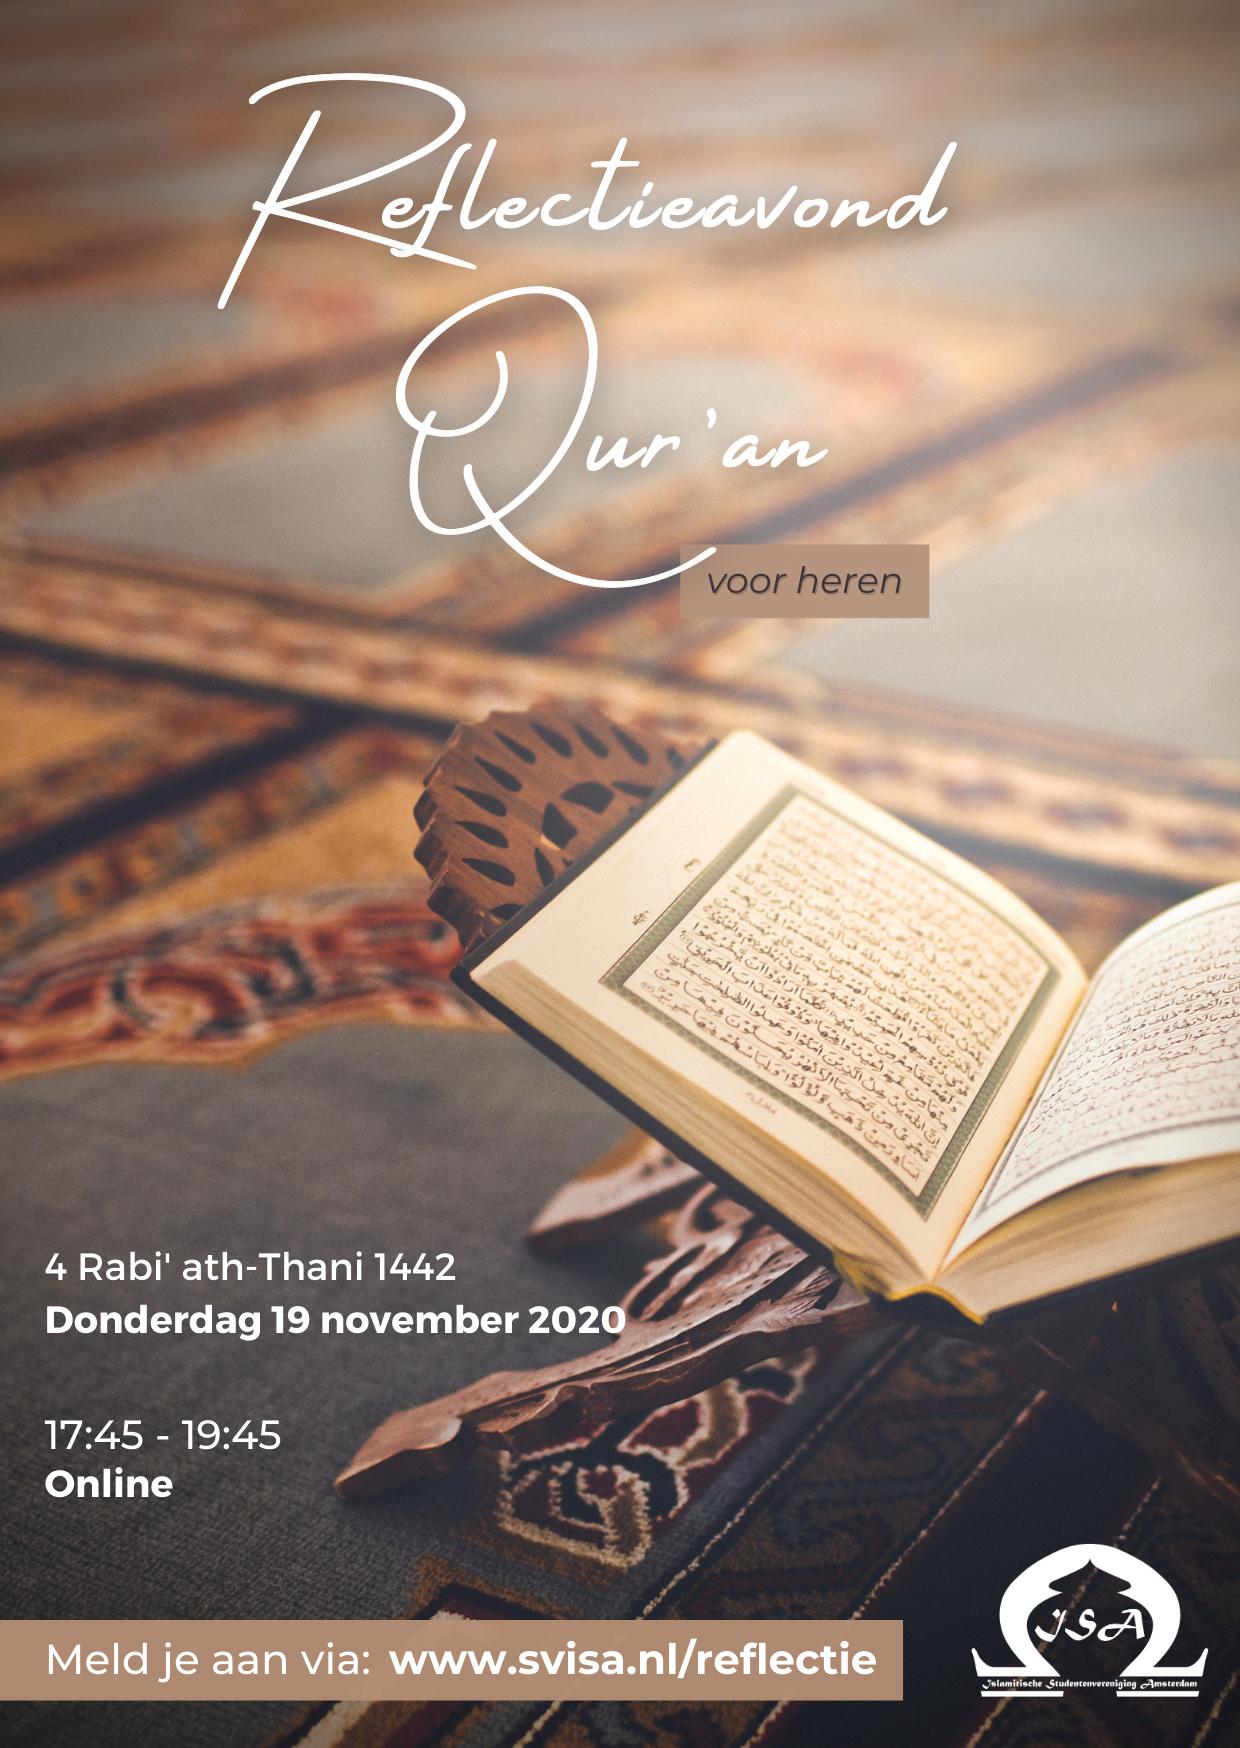 flyer-quran-reflectieavond-heren